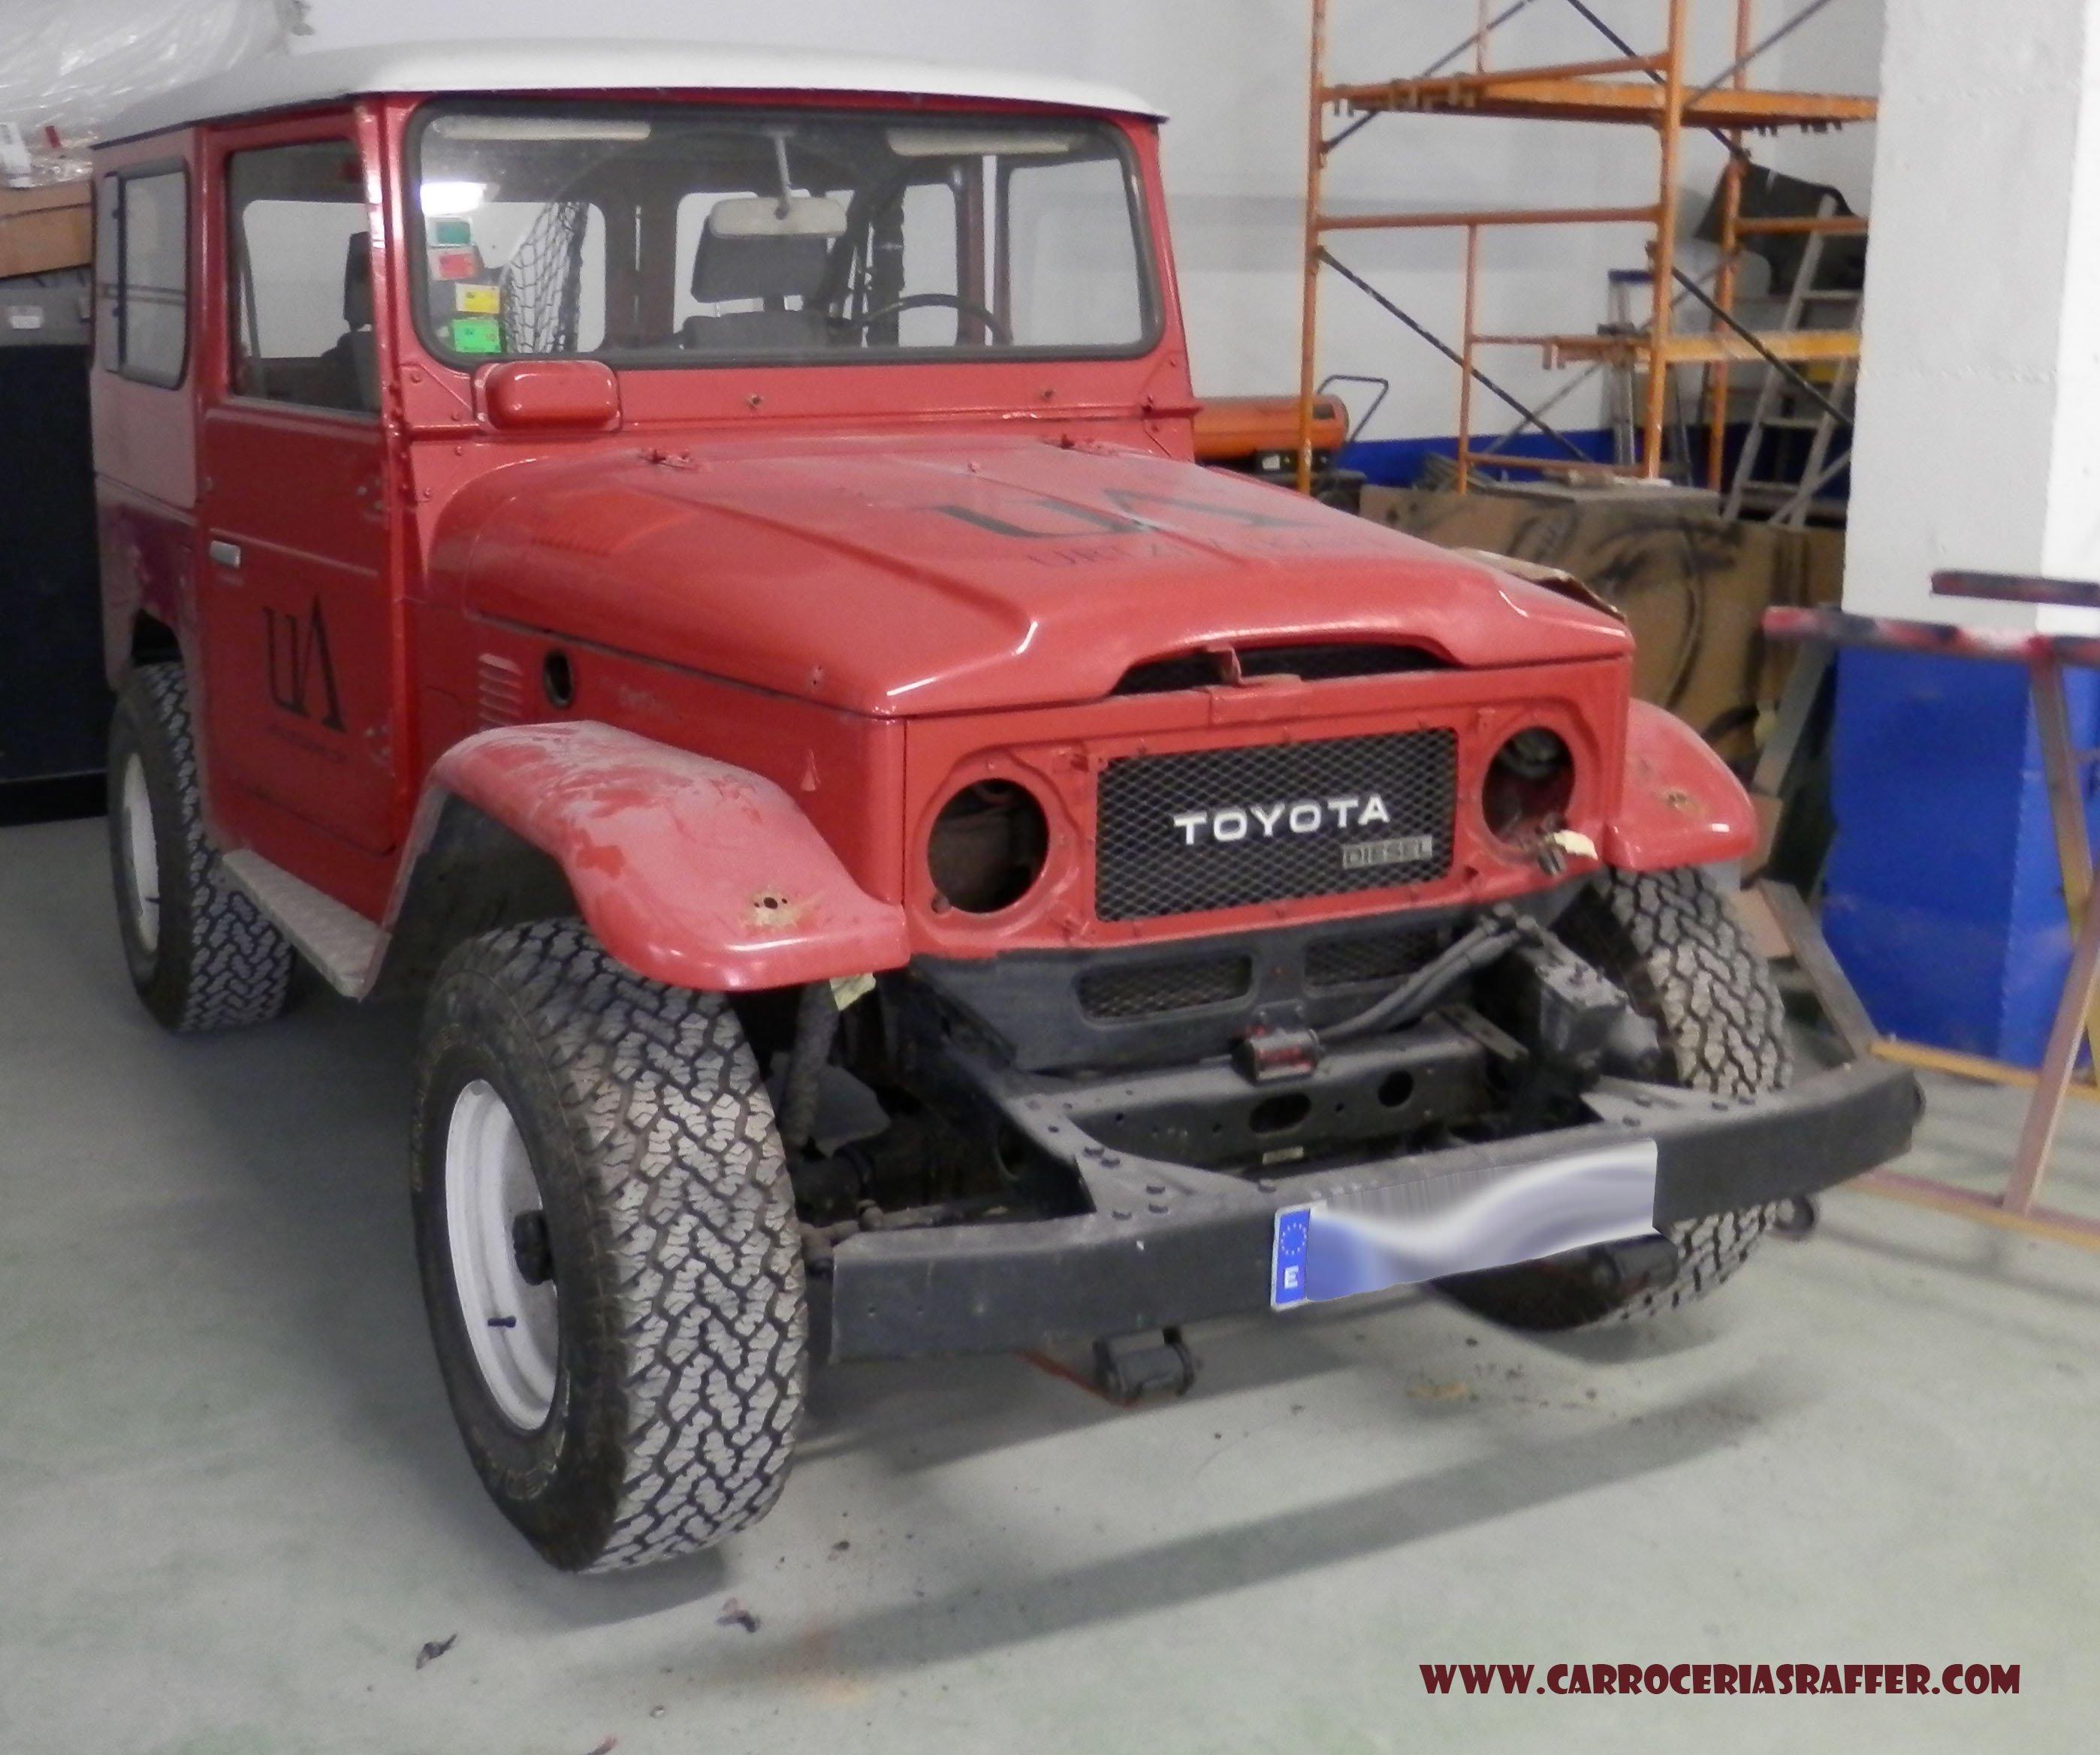 Restauración de Toyota Land Cruiser (BJ40) 2.5 TD de 1983. Reparación de la chapa. 1 de 3.